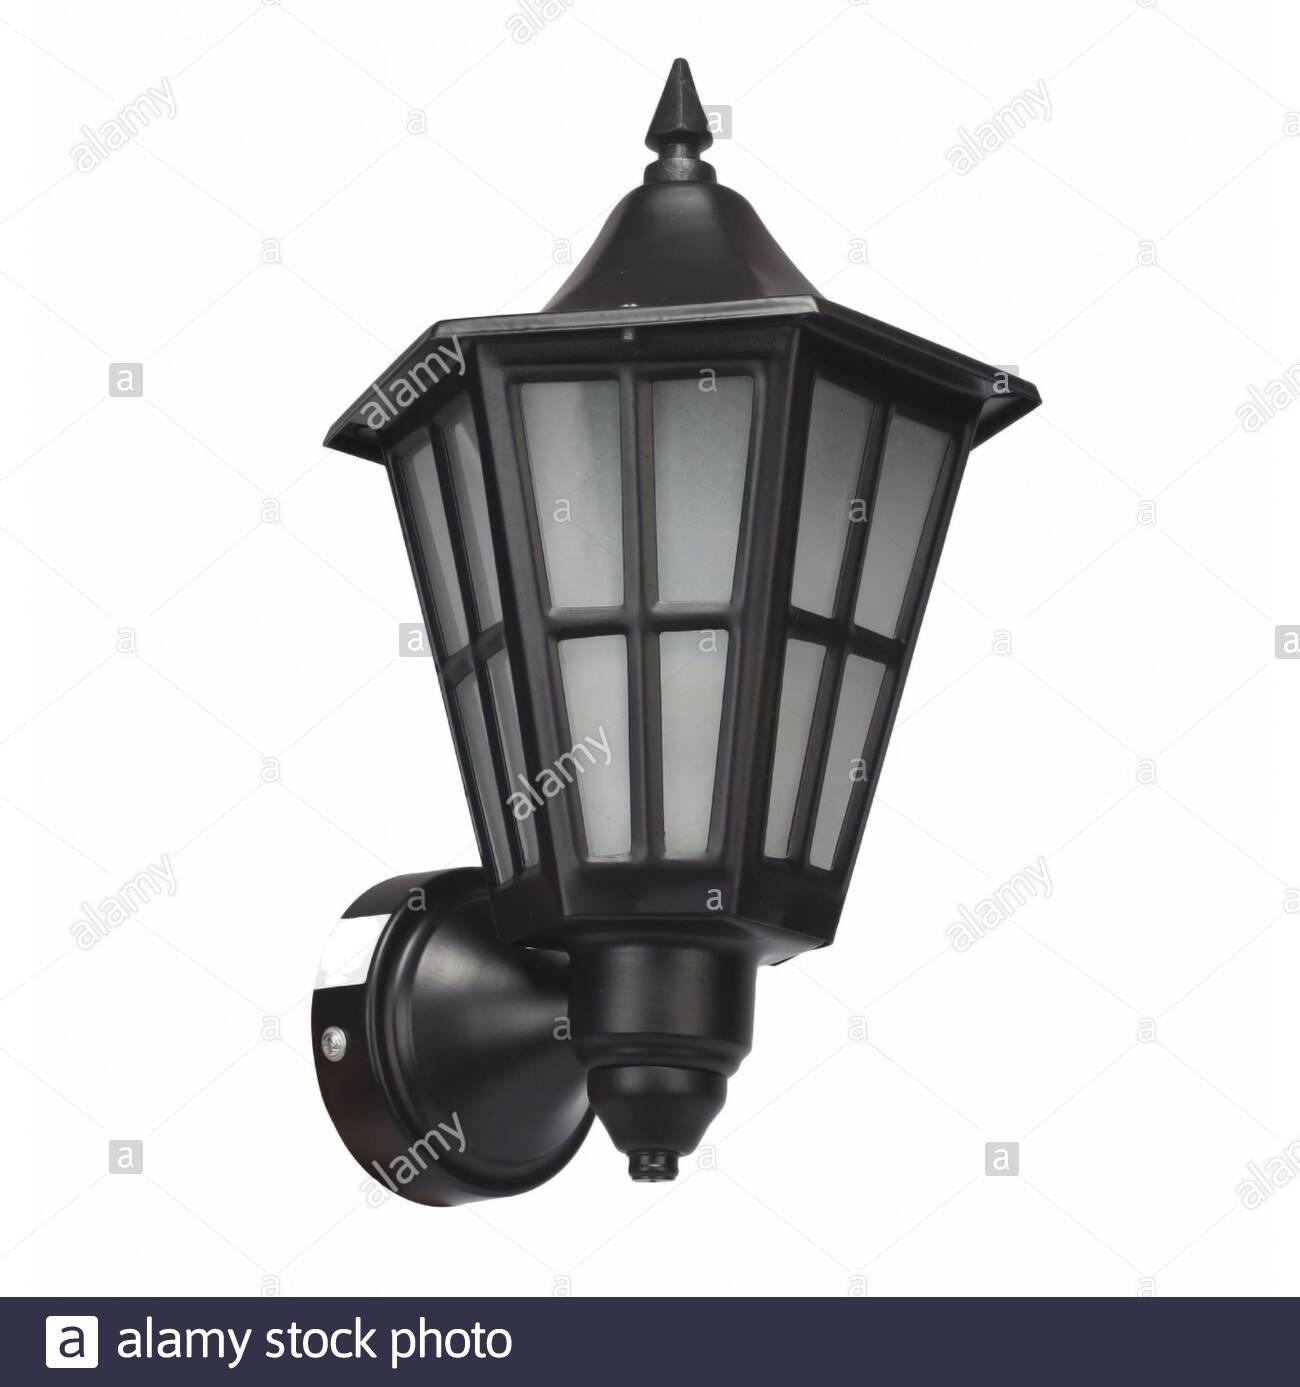 Retro vintage street lamp isolated over white background Stock Photo